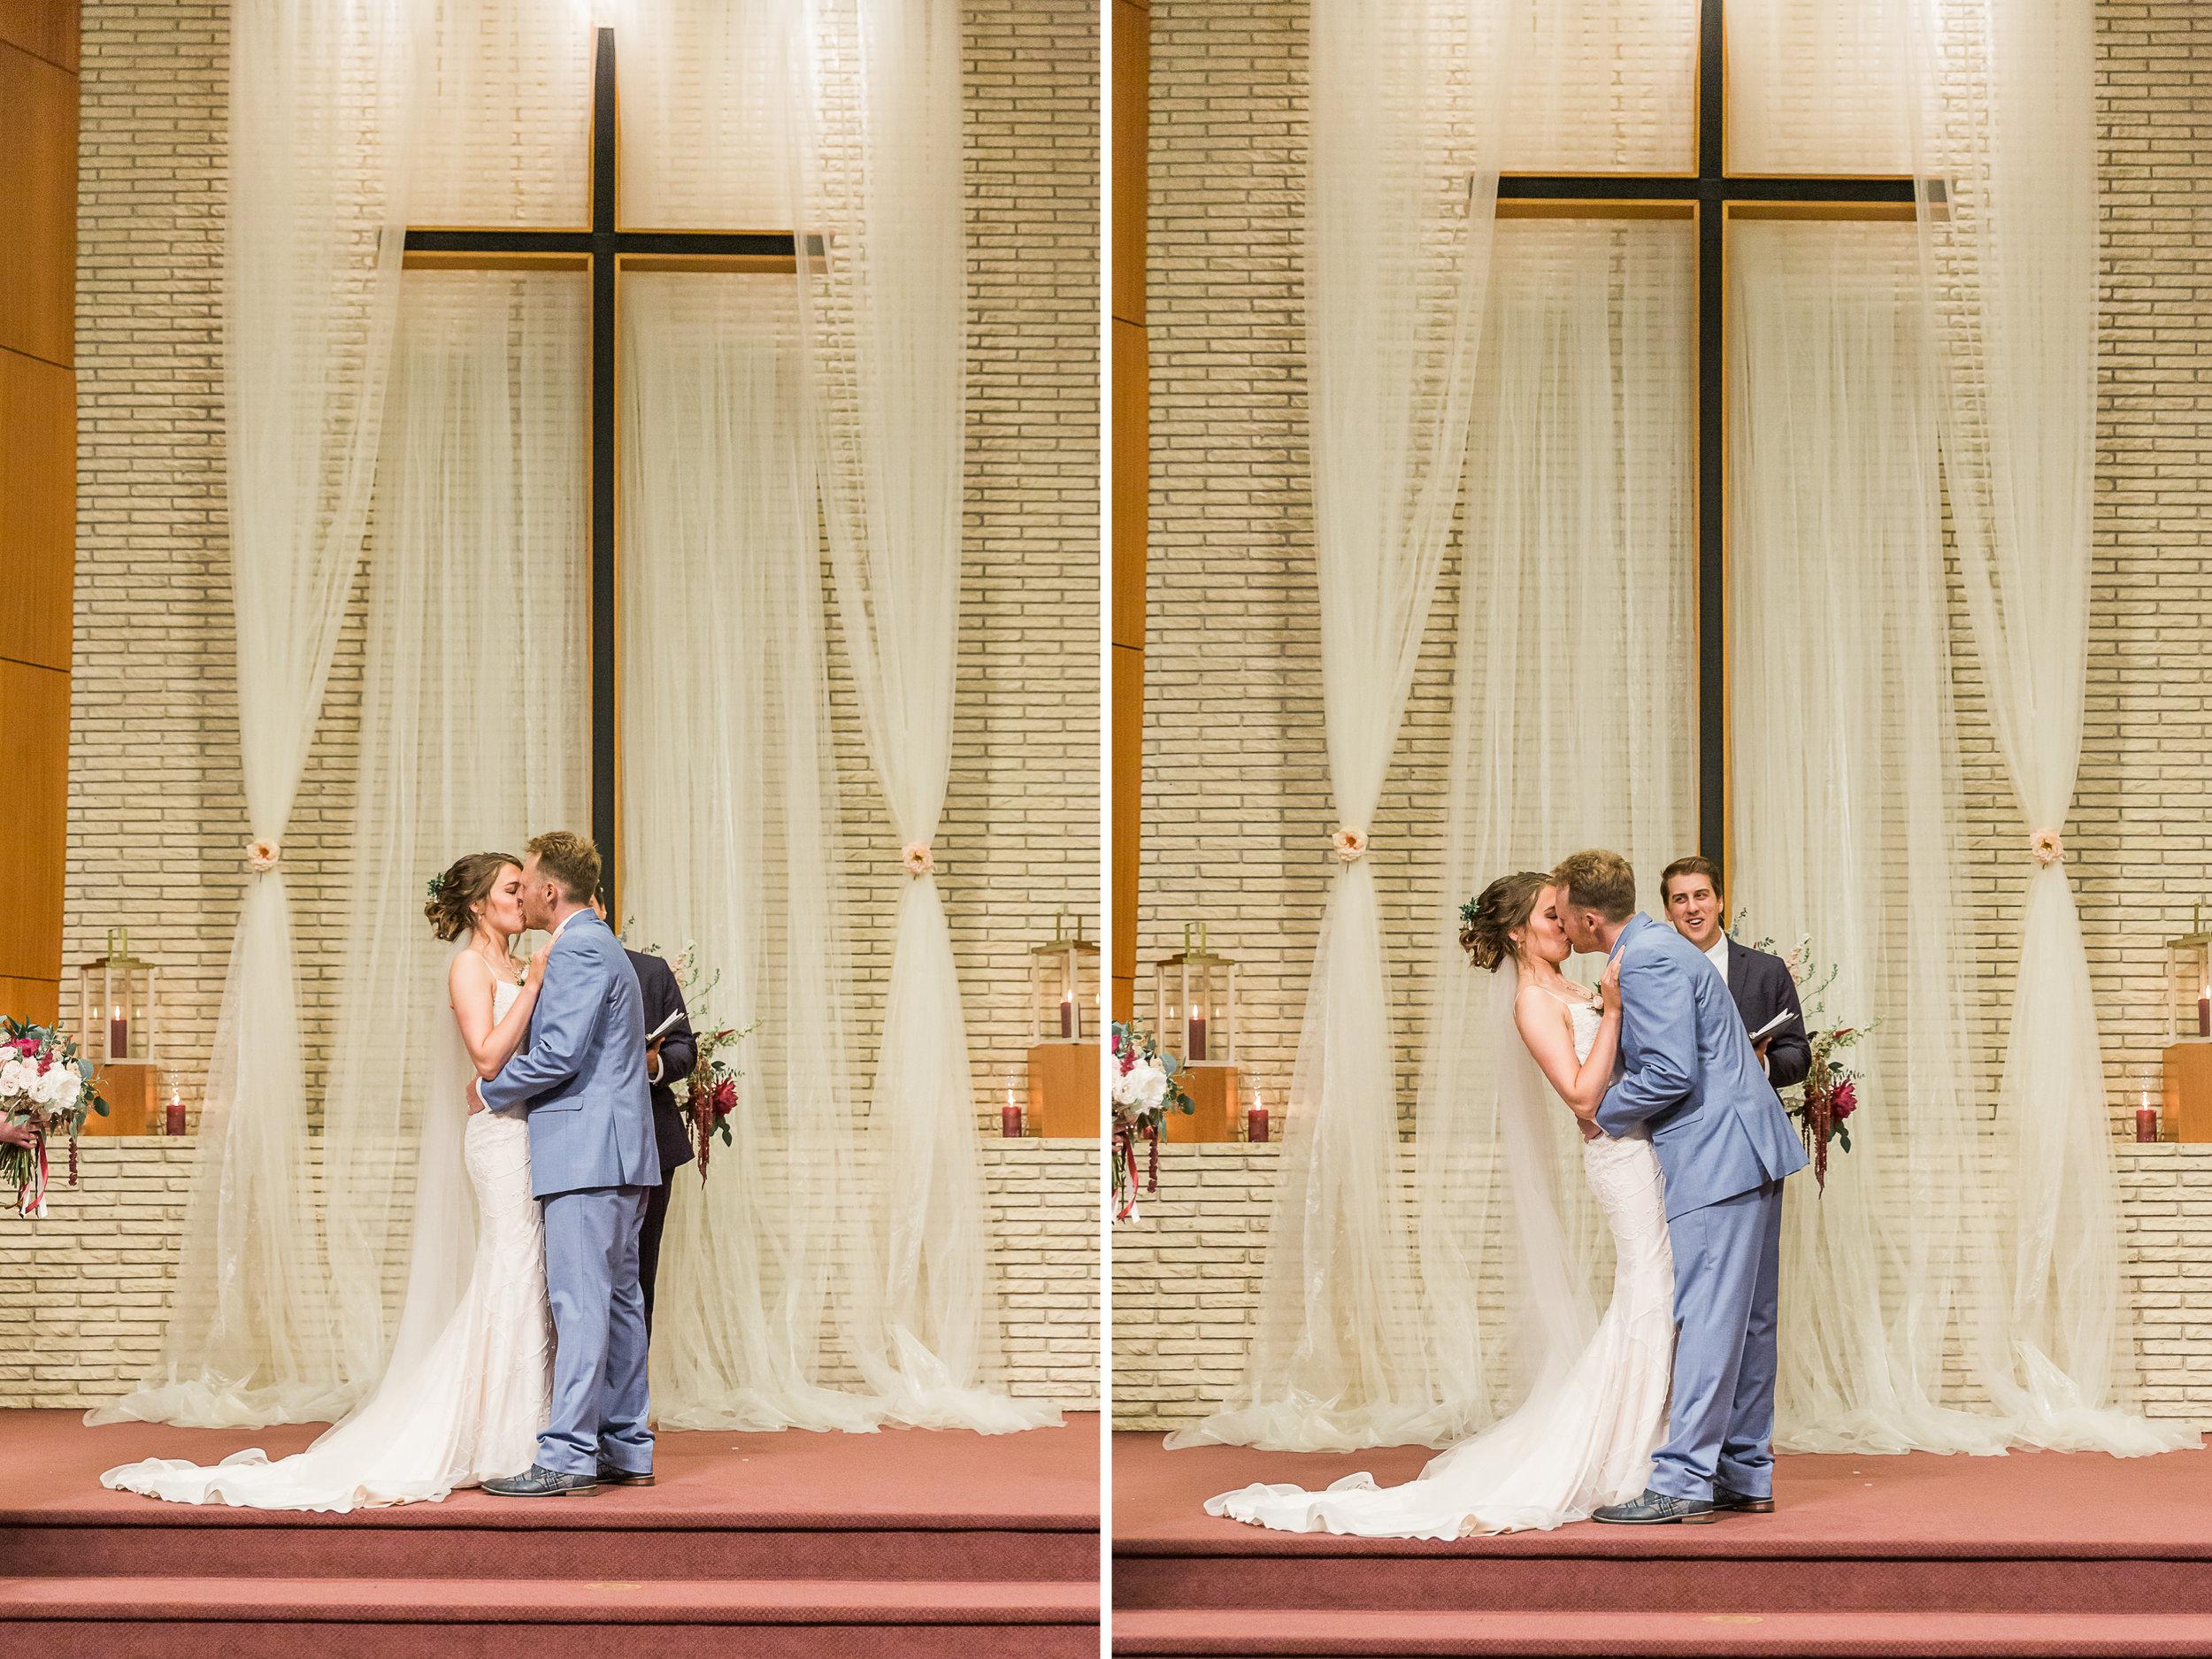 calebclairewedding-12.jpg